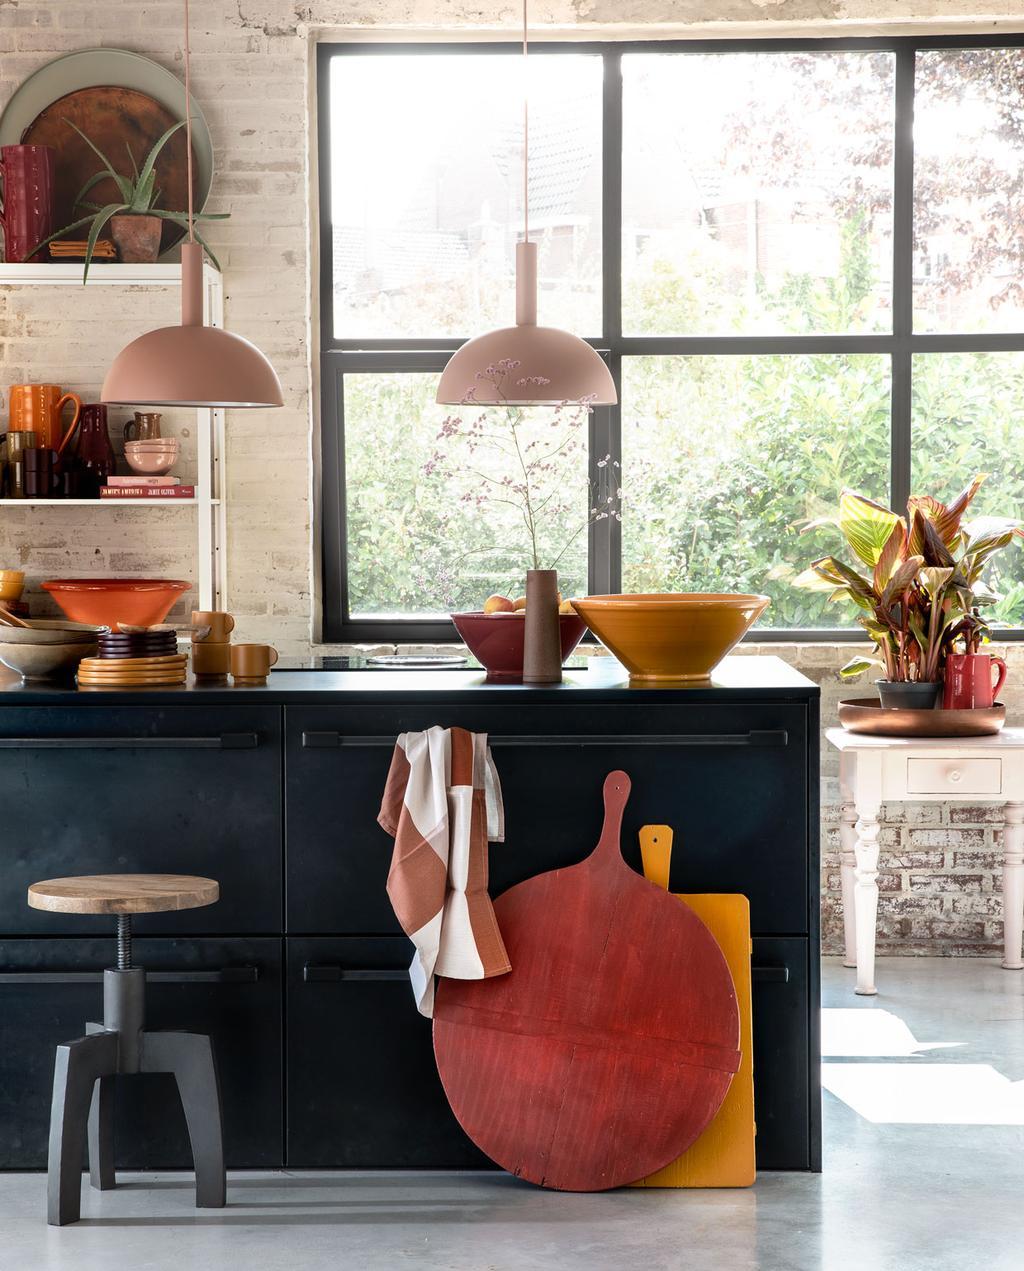 Zo kun je keukenkastjes handig indelen